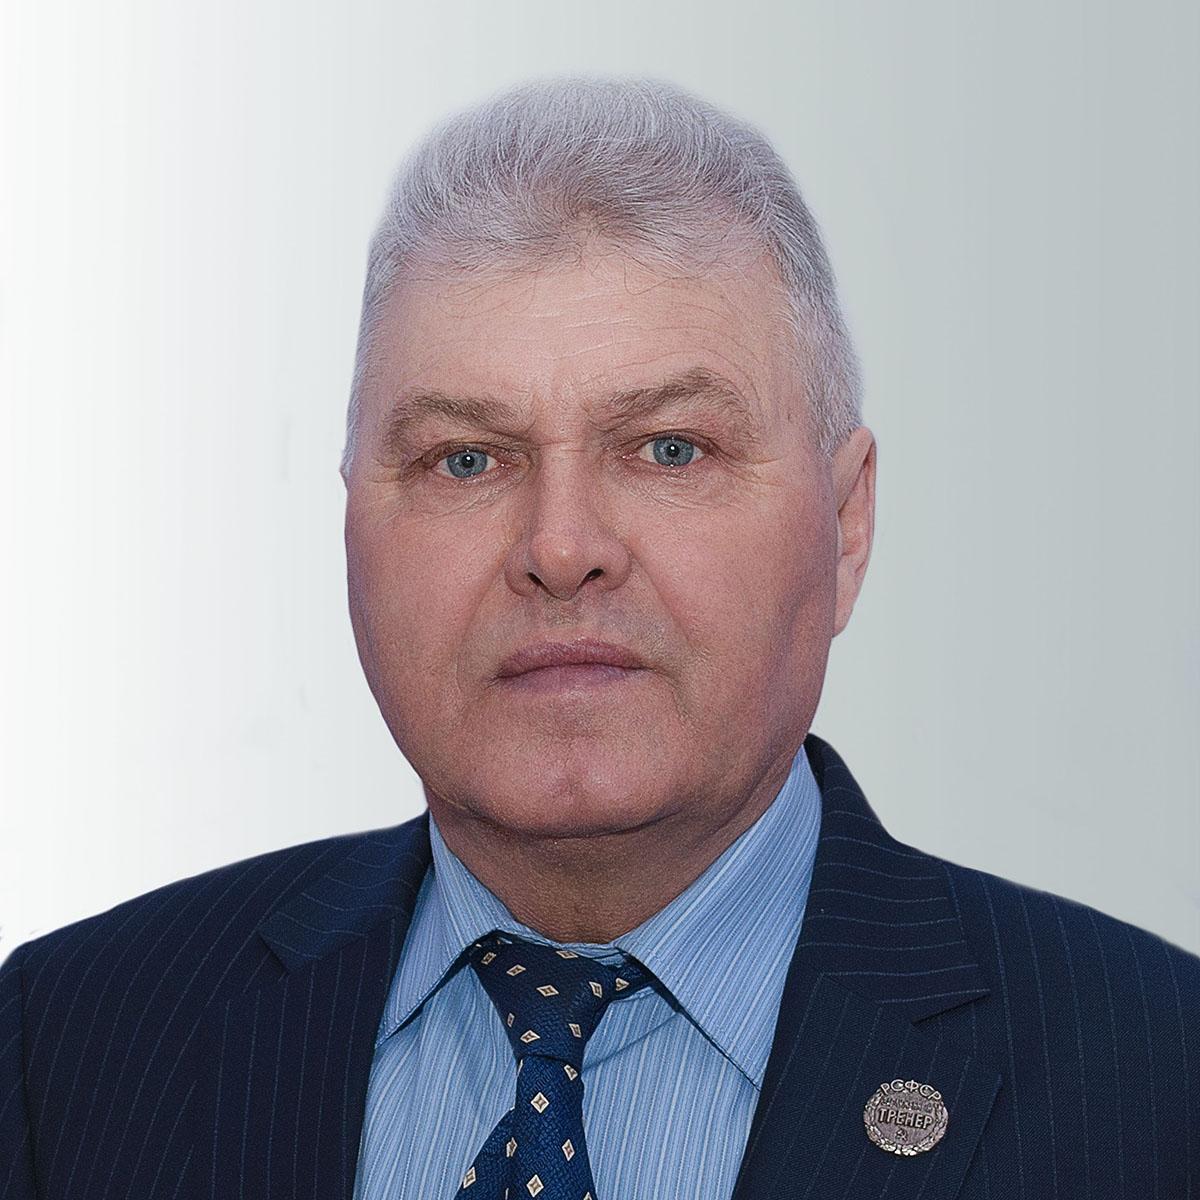 Владимир Ильич Ларин